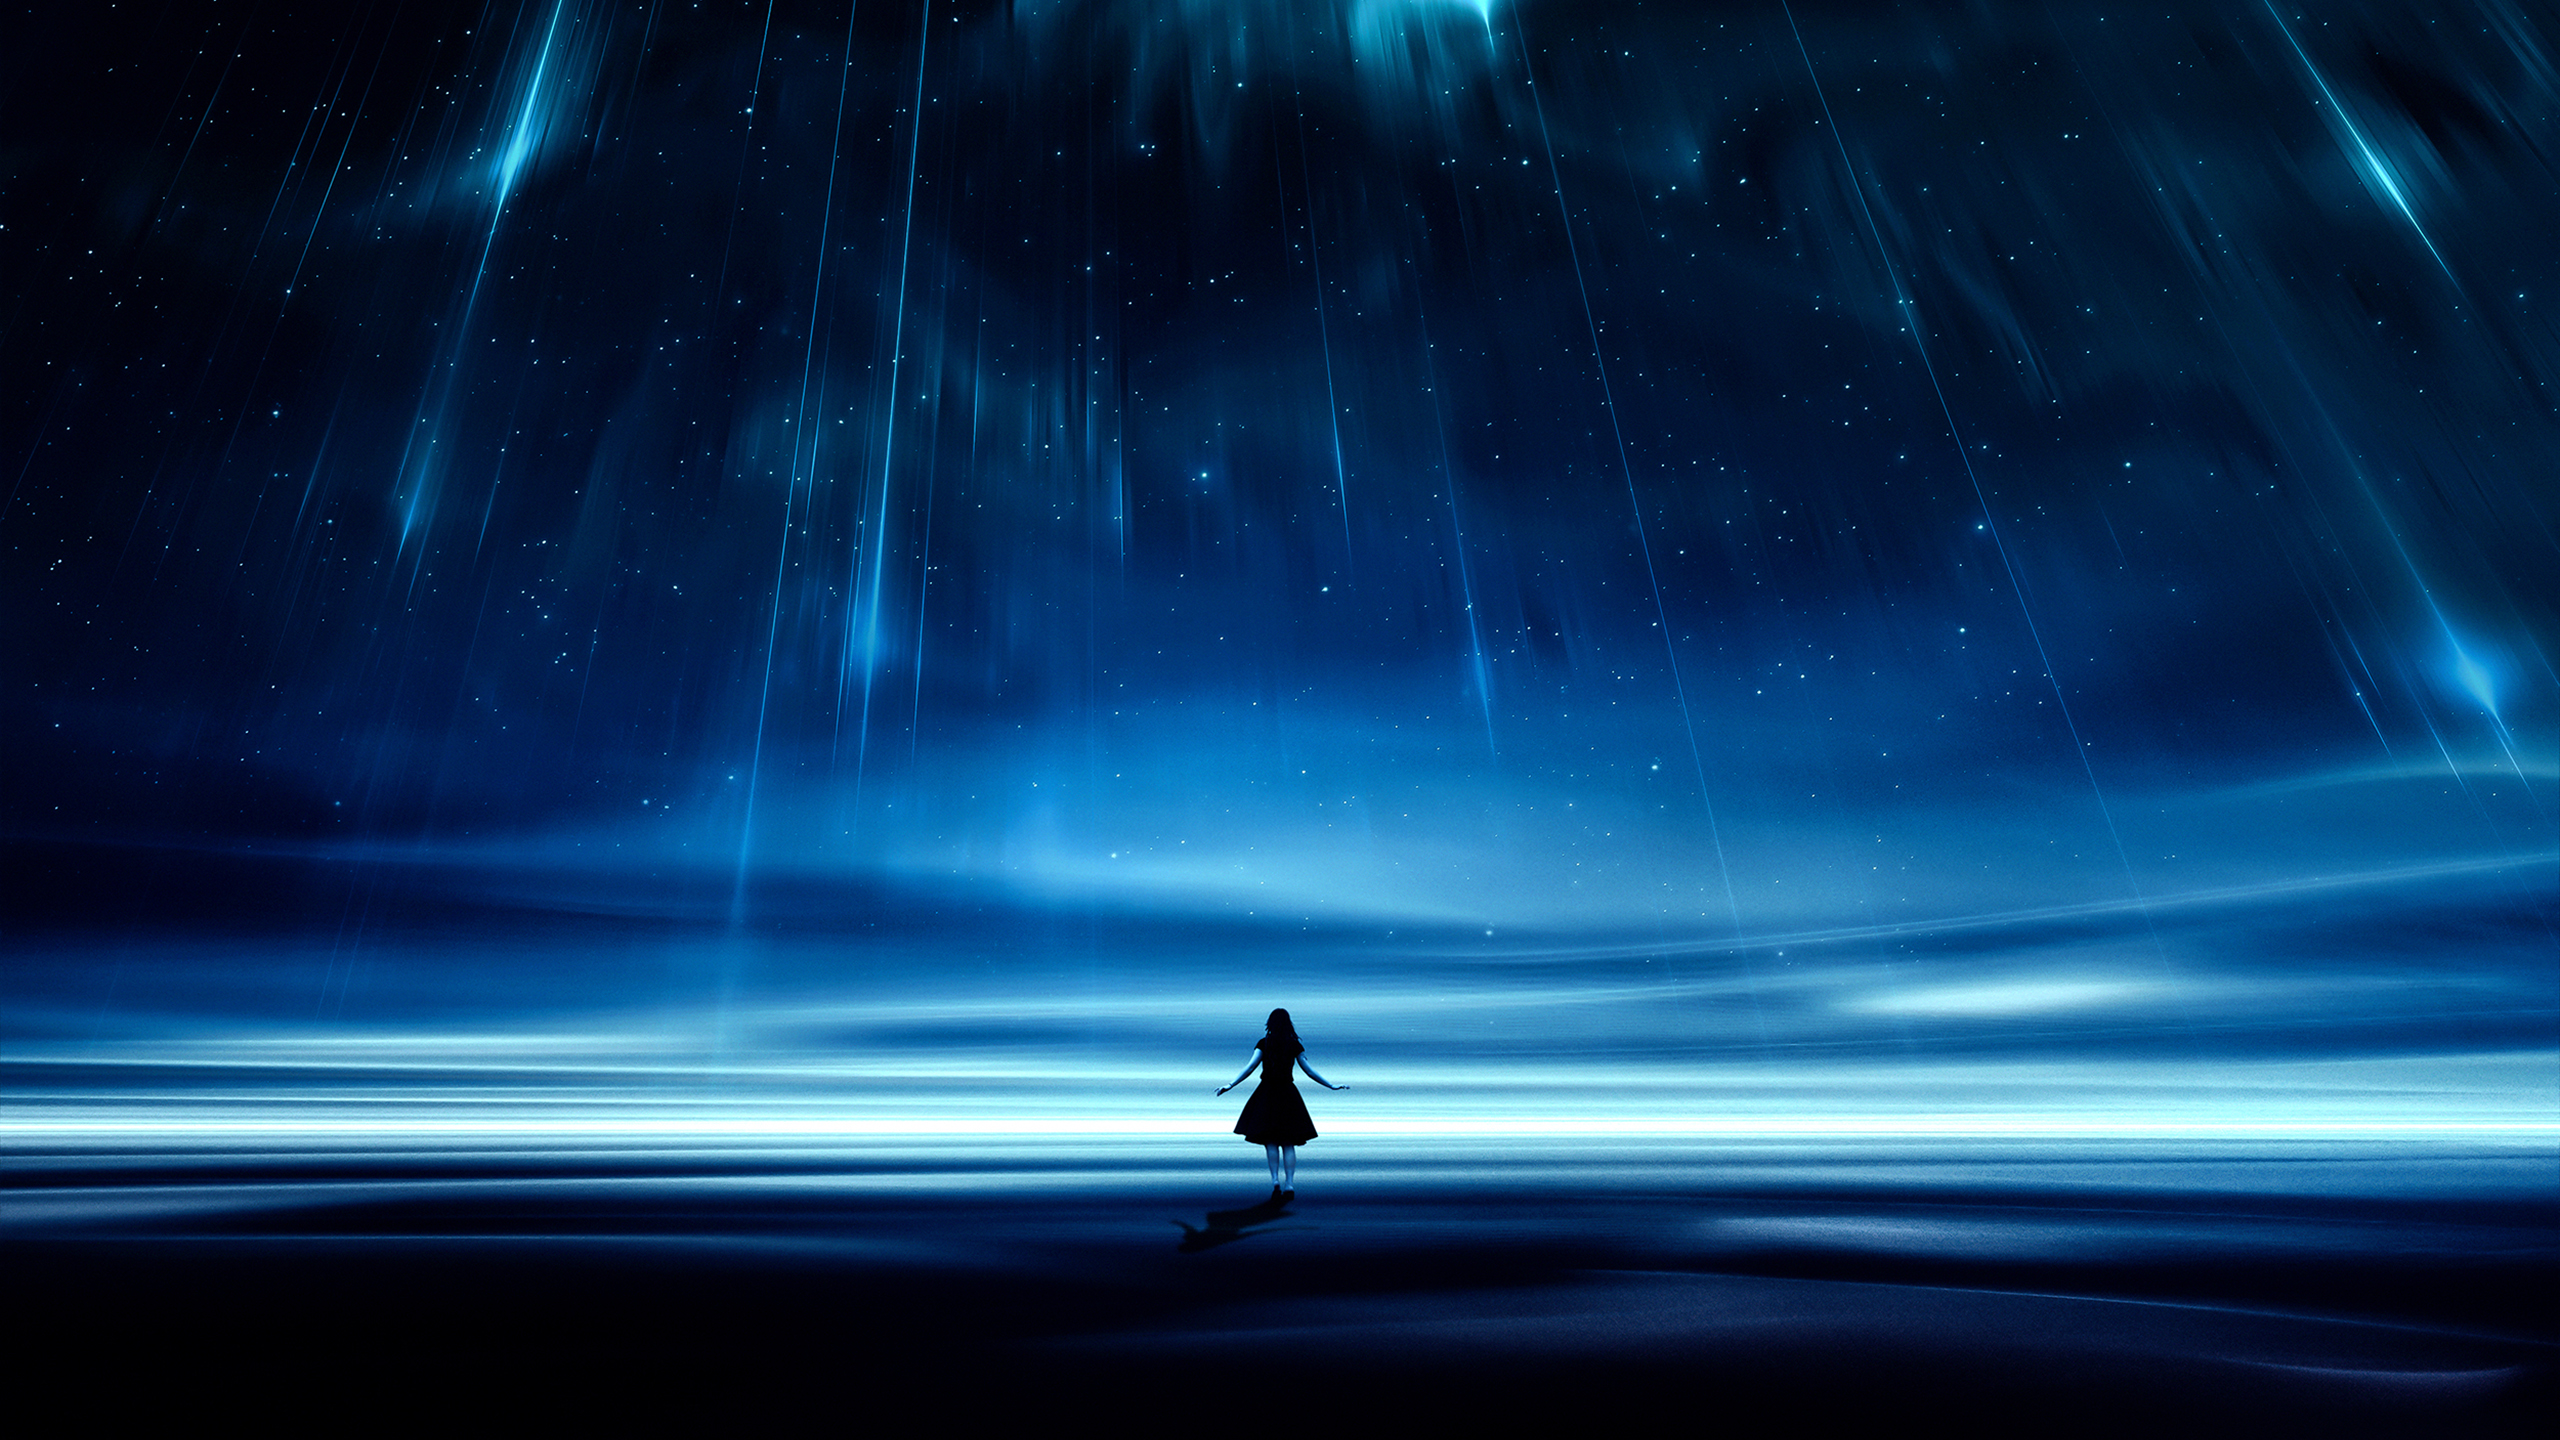 General 2560x1440 digital digital art photography Photoshop photo manipulation landscape night sky skyscape starry night blue dark lights women outdoors women outdoors stars shooting stars space galaxy silhouette fantasy art dreamscape magic